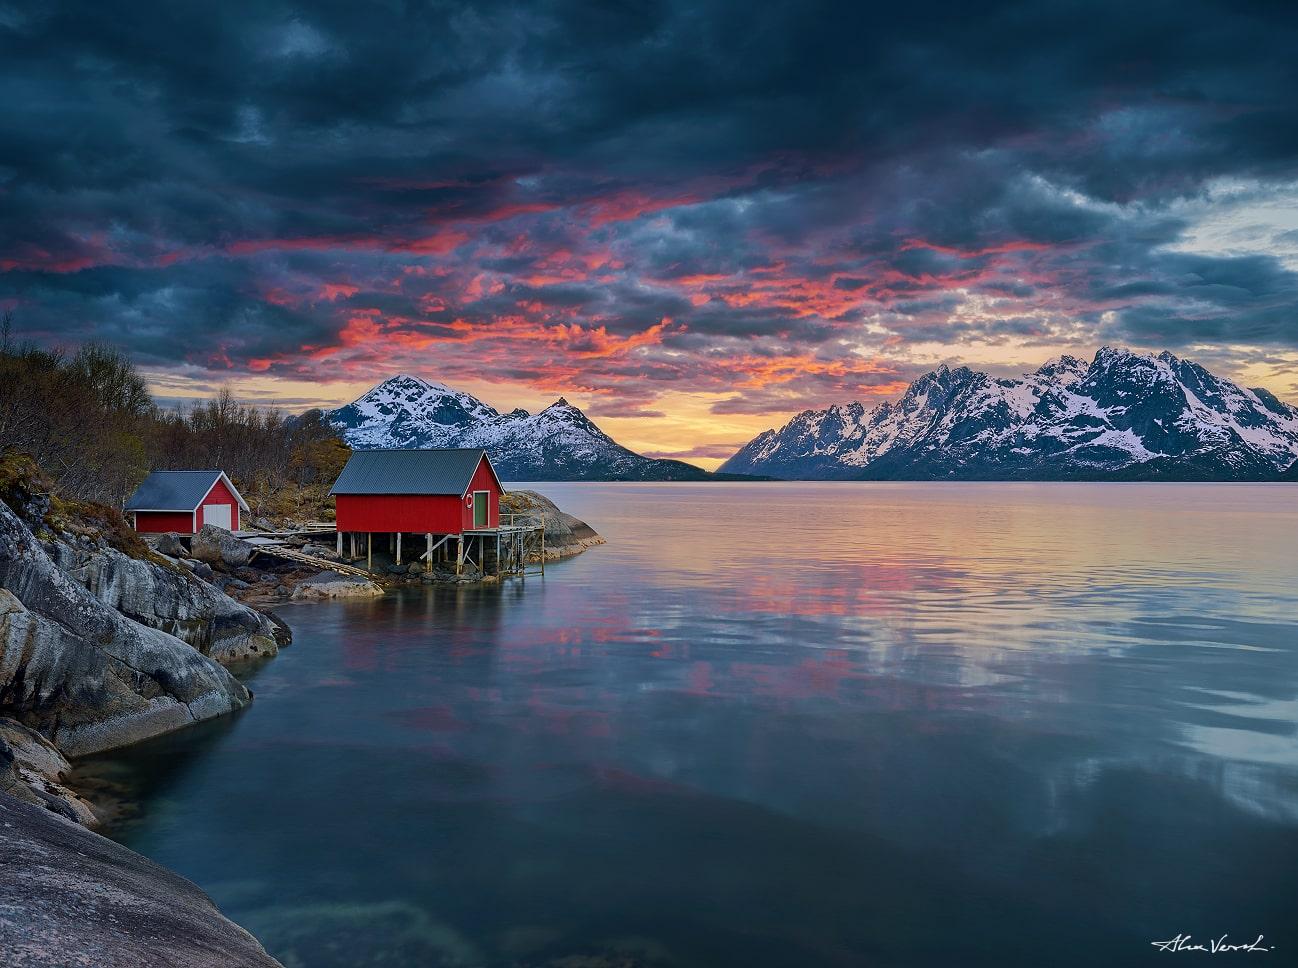 Lofoten Islands, shelter, Alexander Vershinin, Norwegian photo